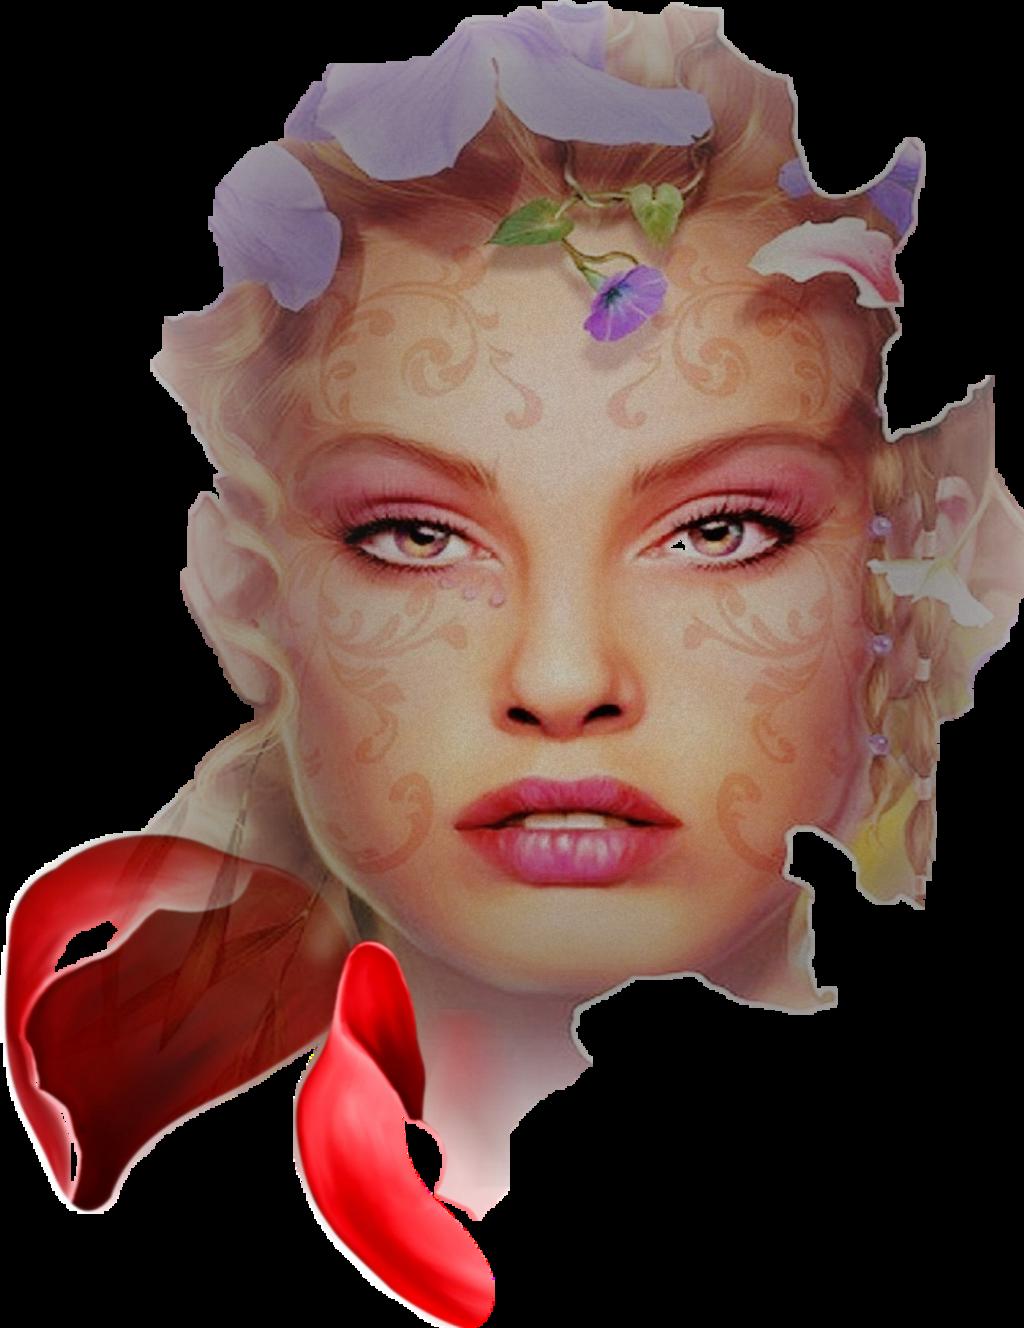 #woman #face